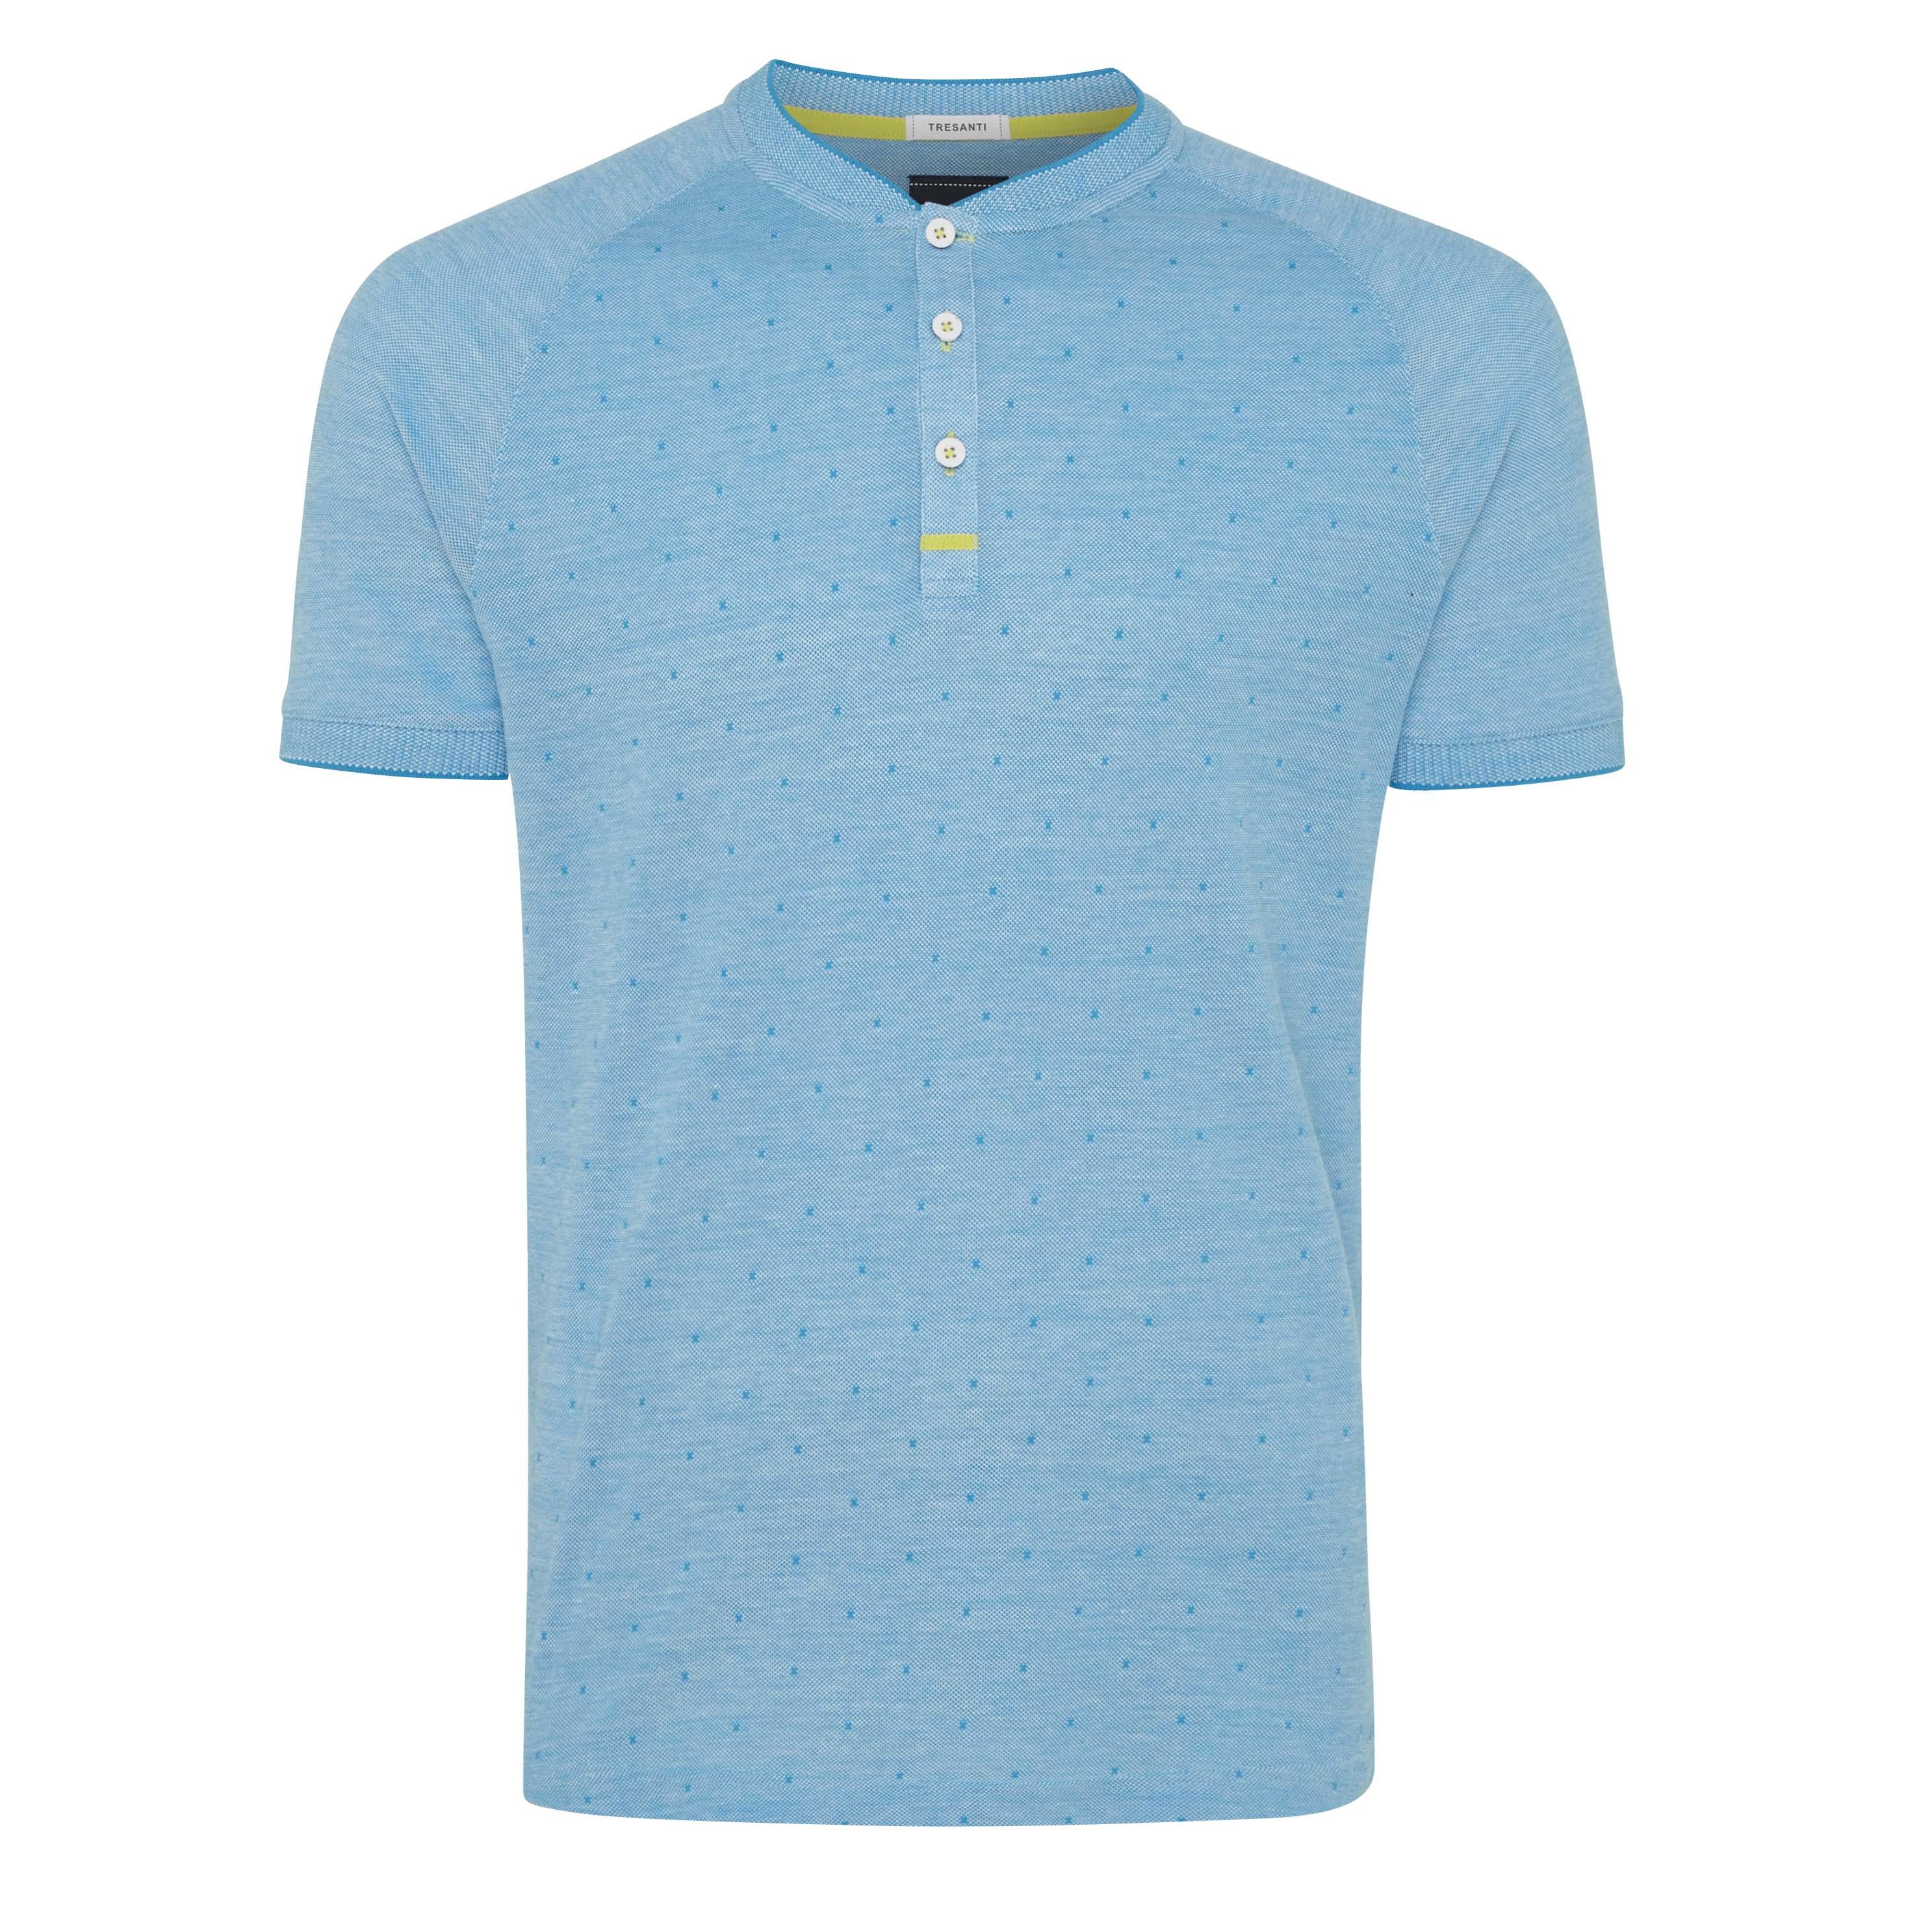 Terrence | T-shirt raglan sky blue